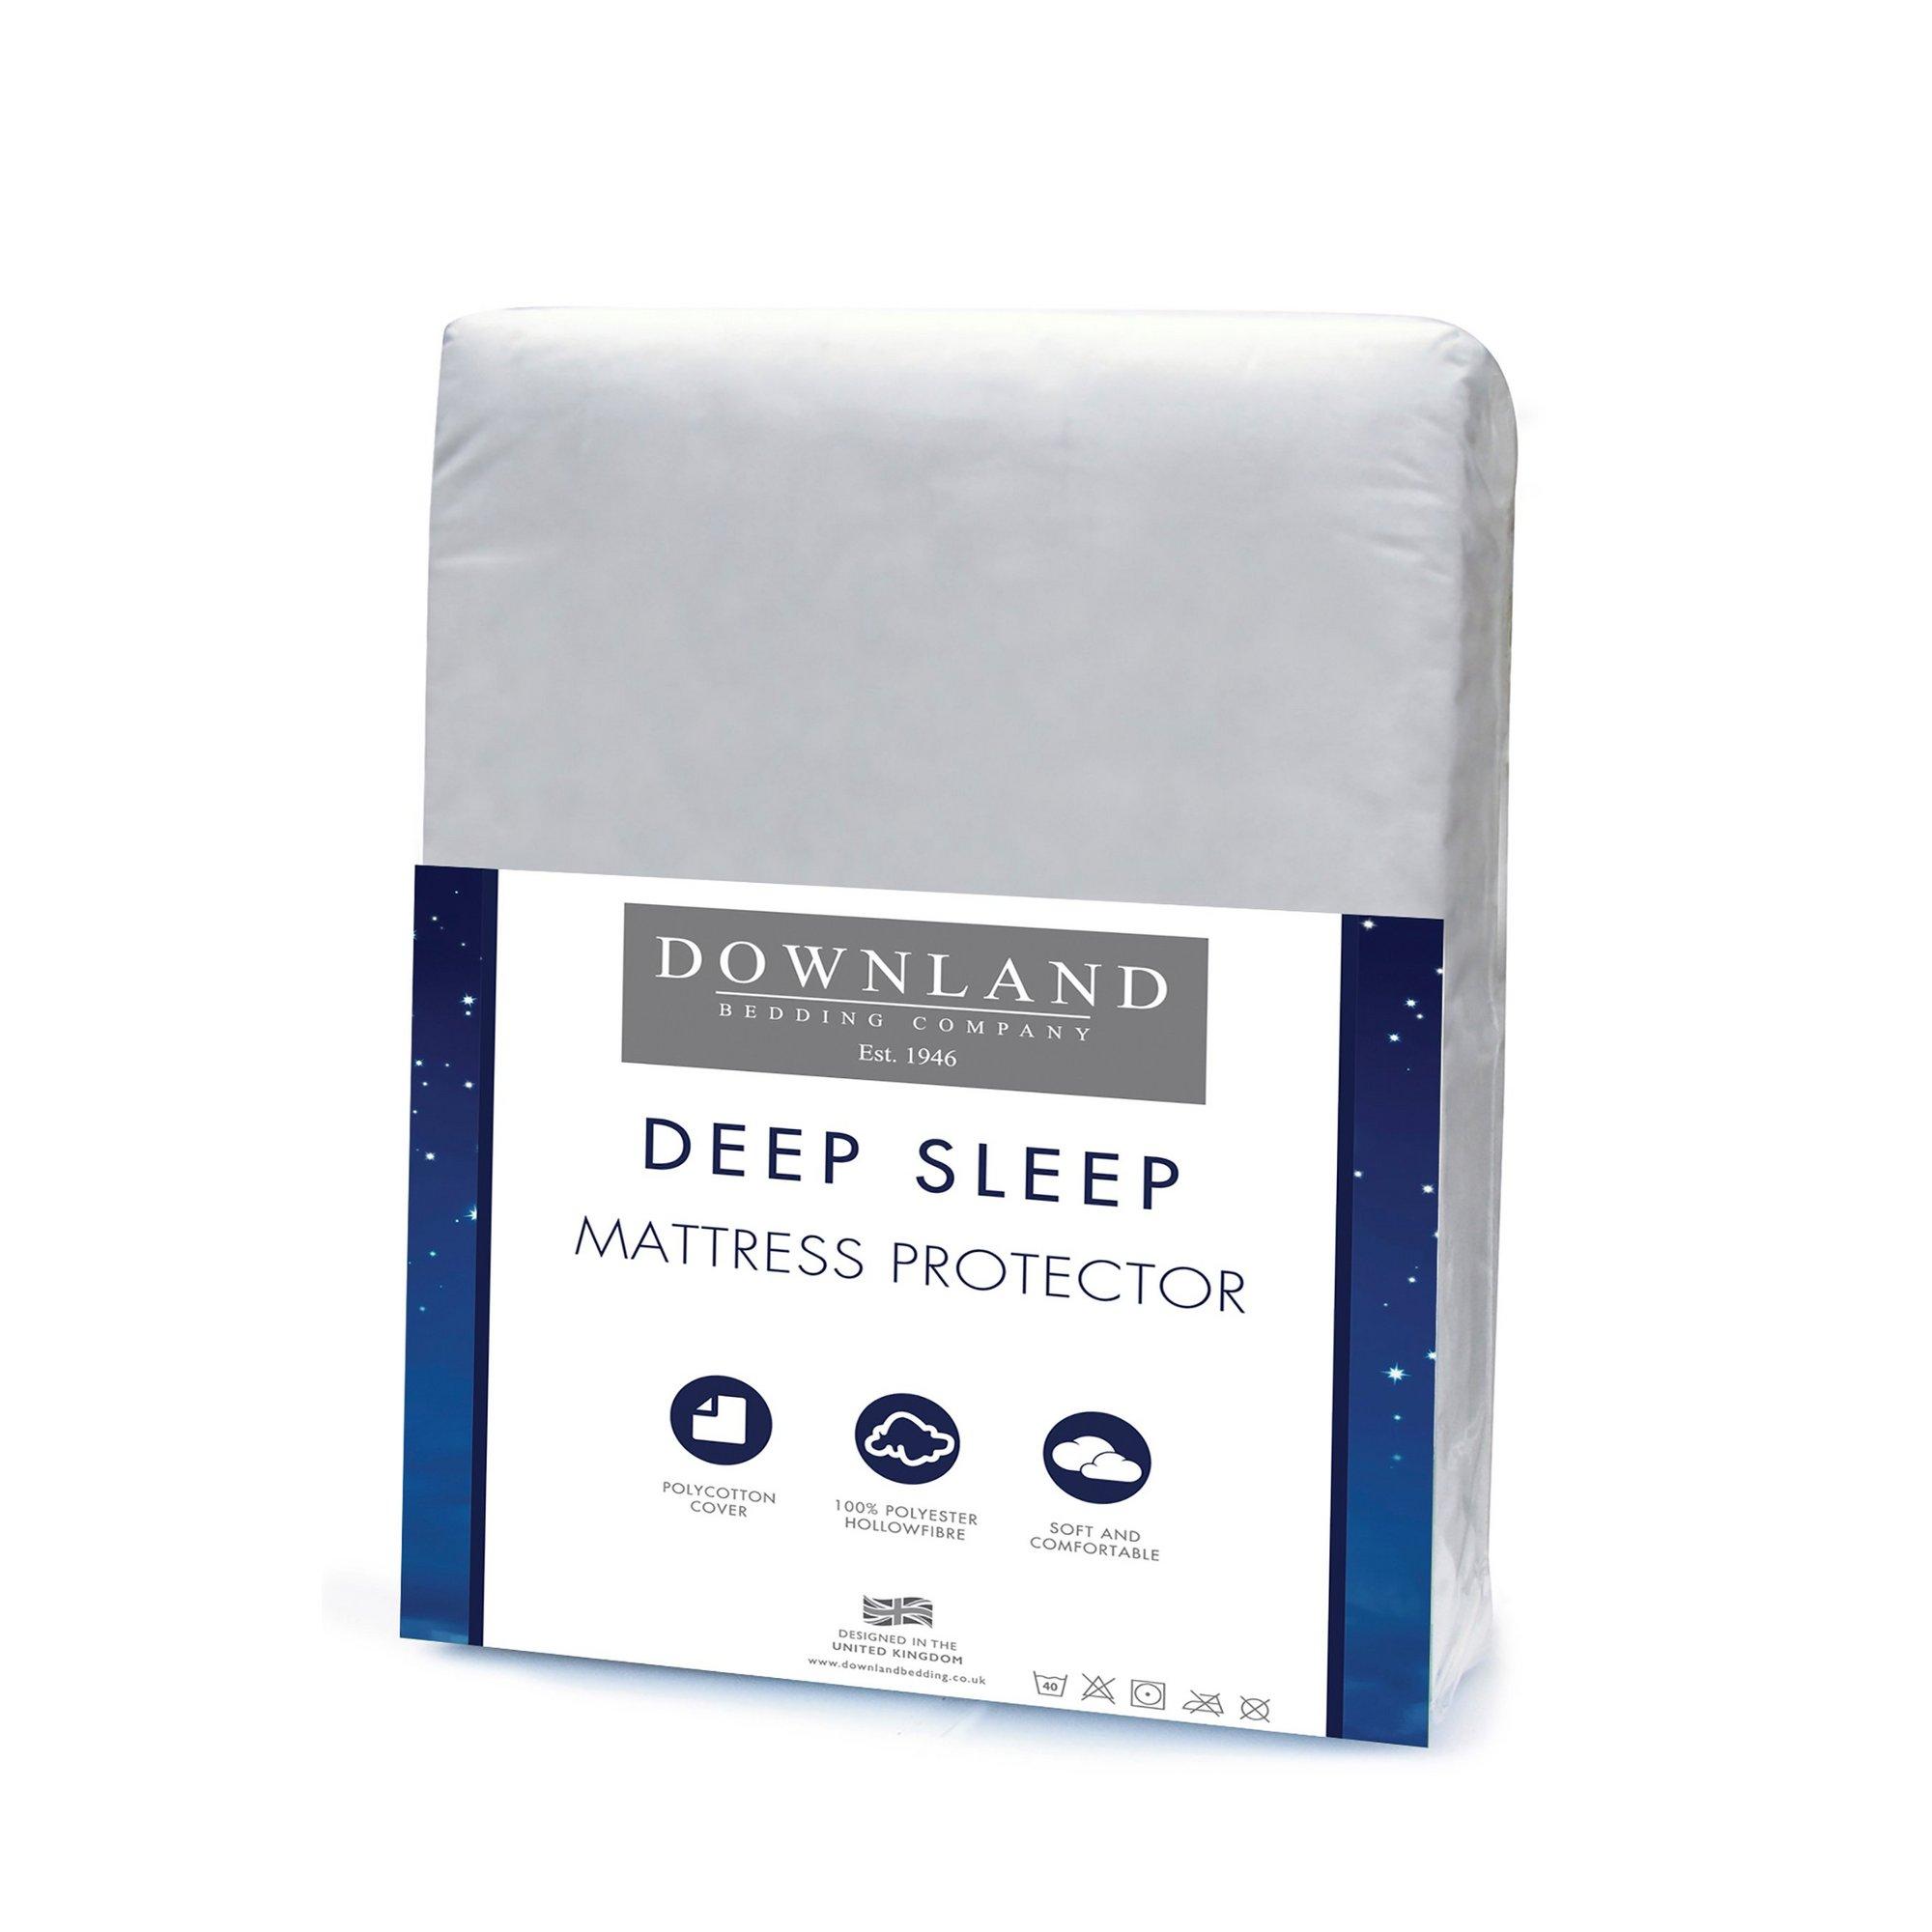 Image of Downland Deep Sleep Mattress Protector